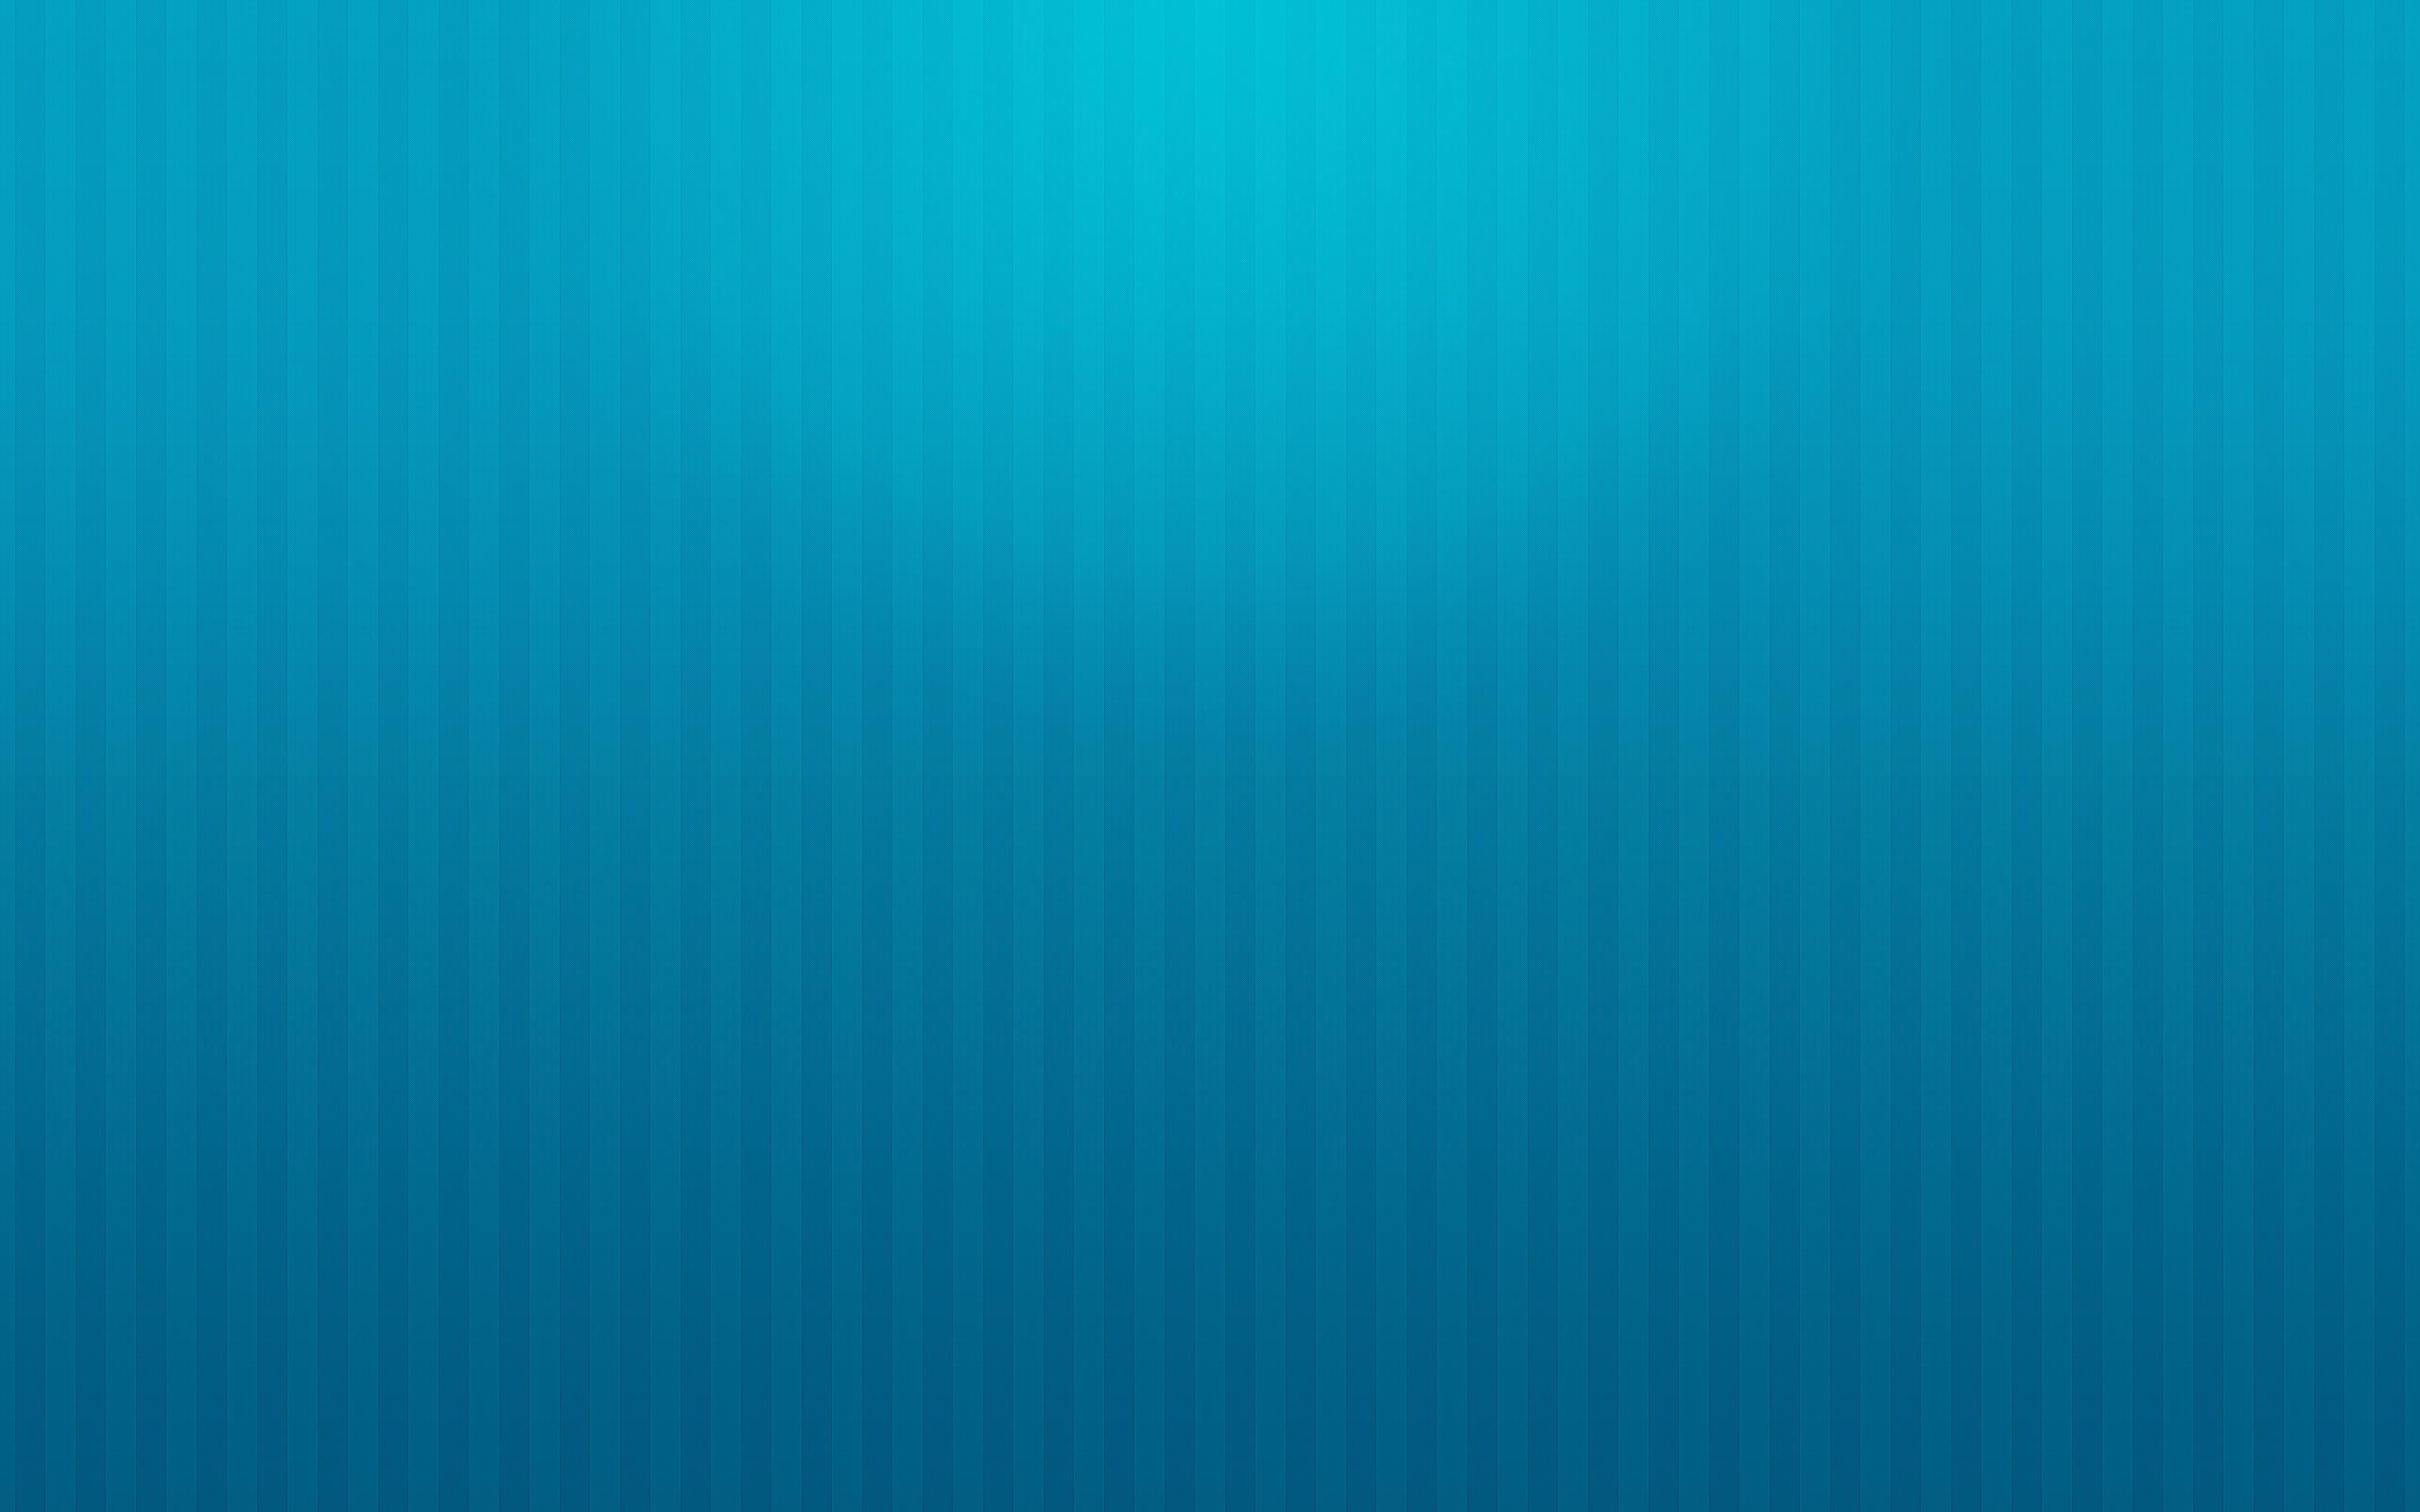 Plain Desktop Background Daily Pics Update HD Wallpapers Download 2560x1600